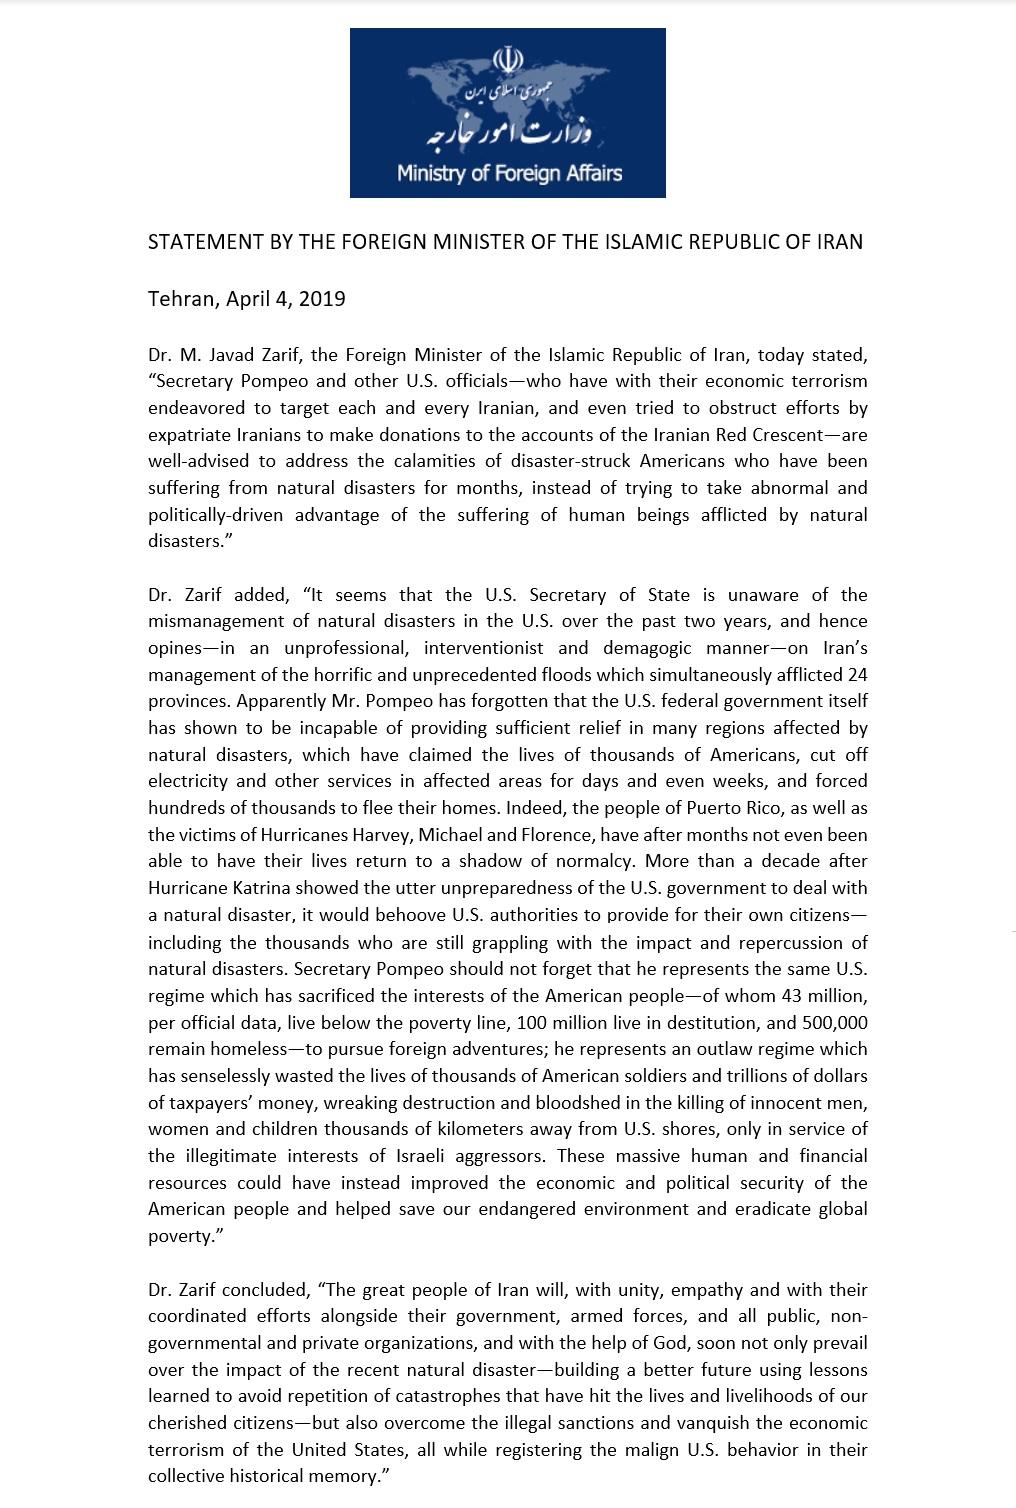 Zarif statement